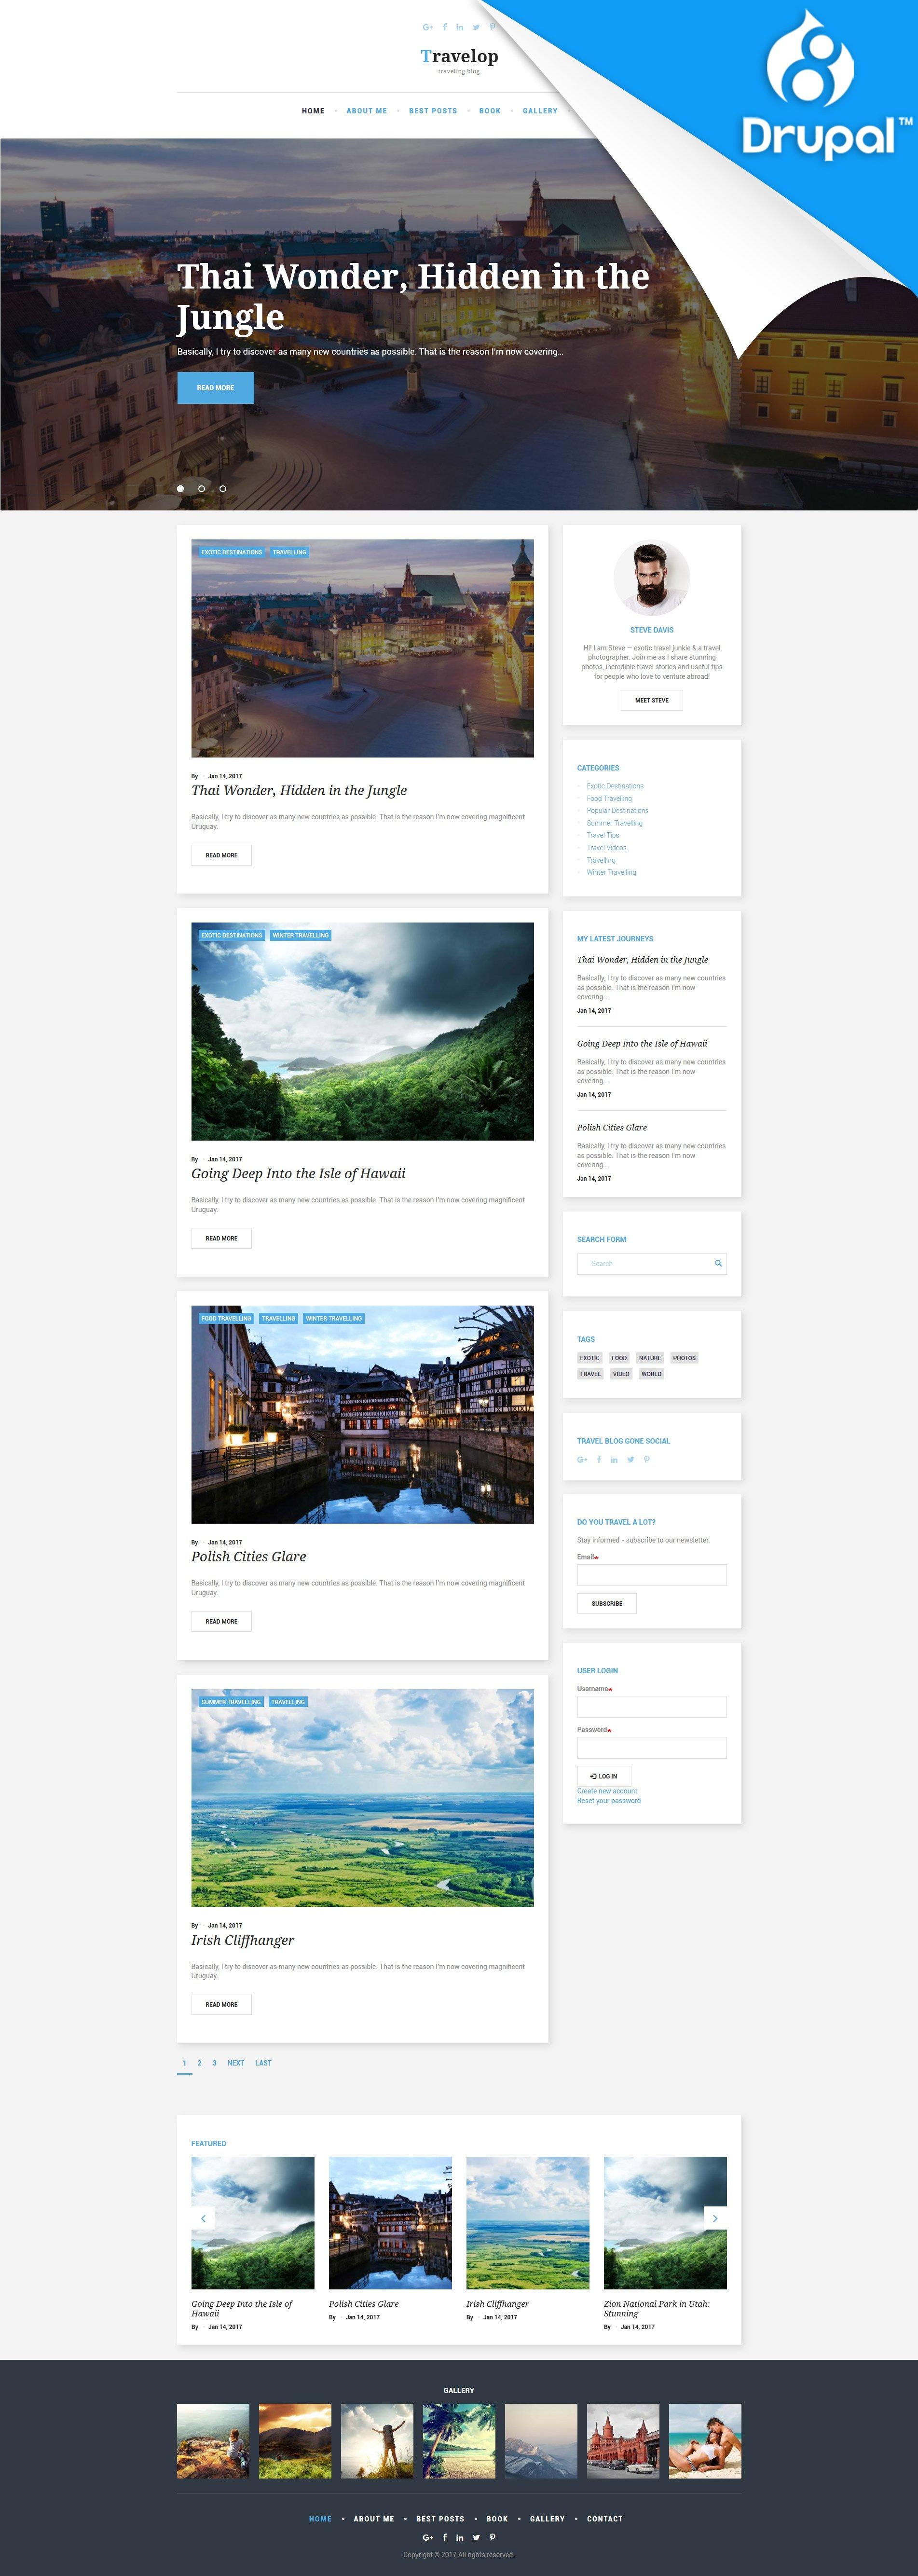 """Travelop - Traveling Blog"" - адаптивний Drupal шаблон №59576"